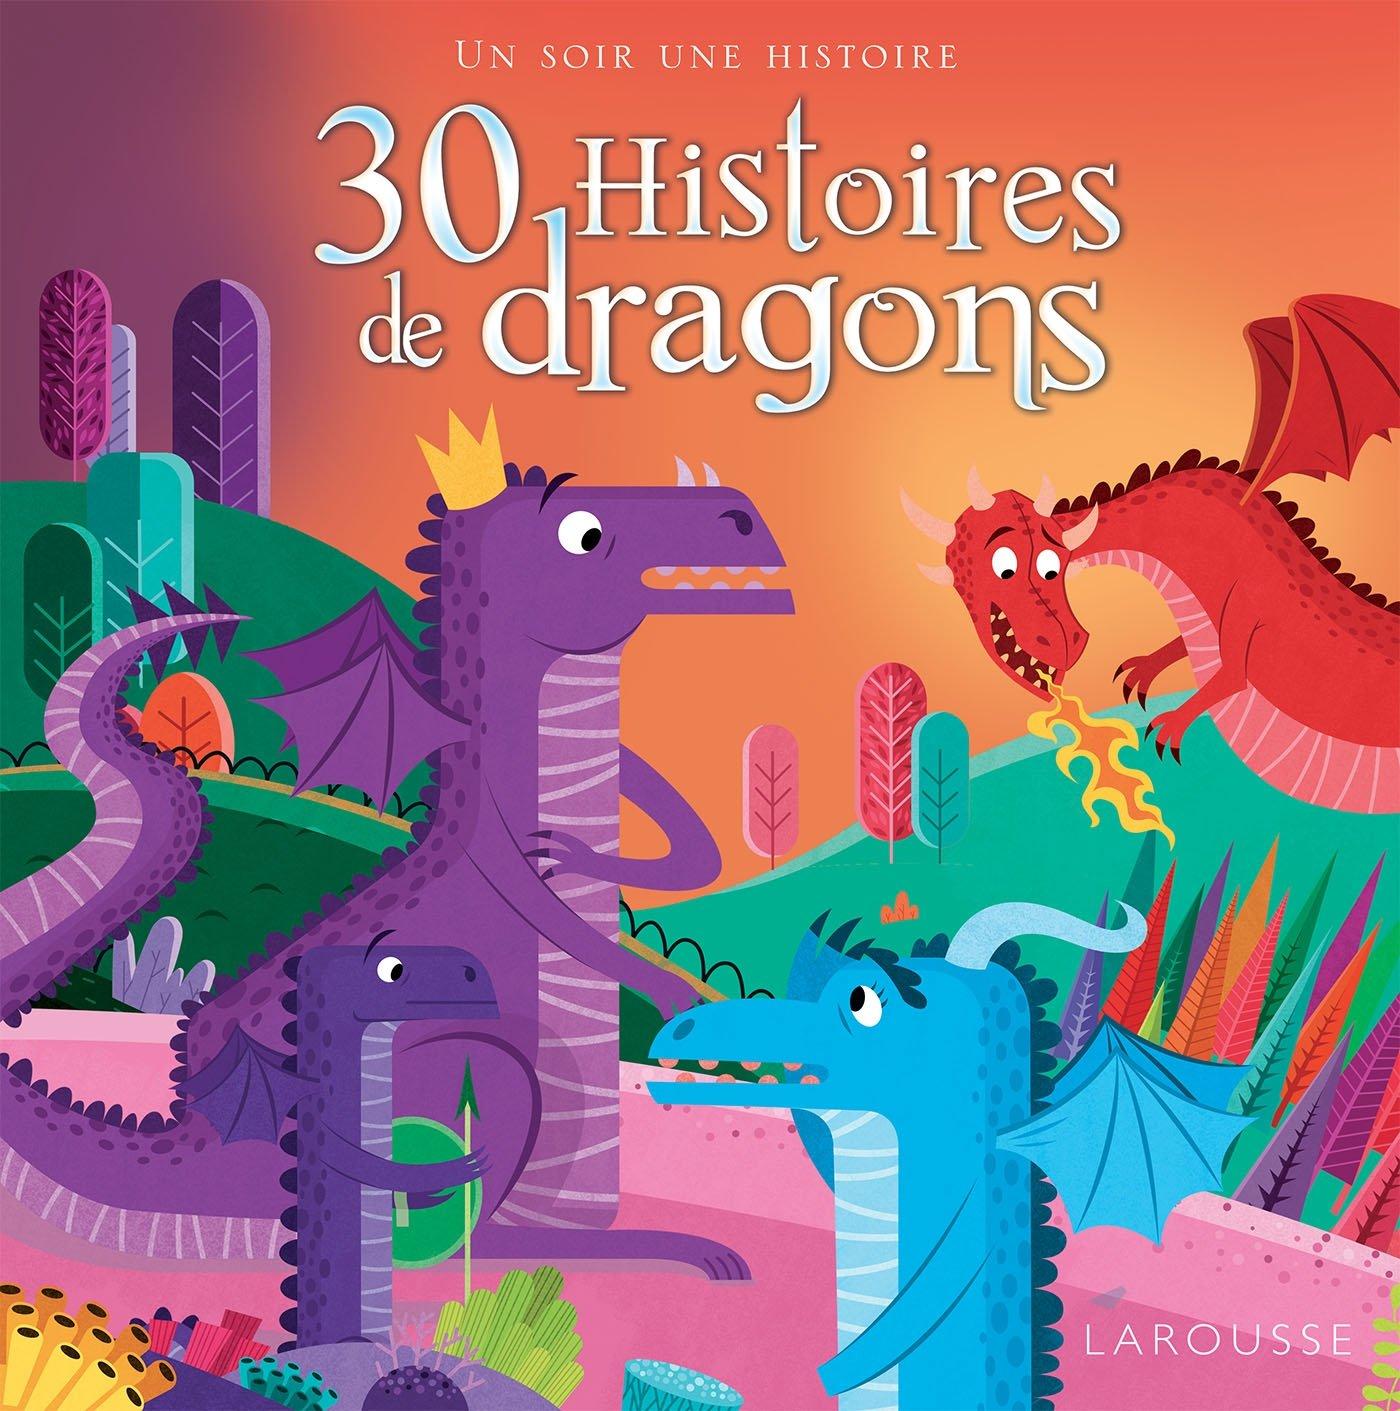 30 dragons